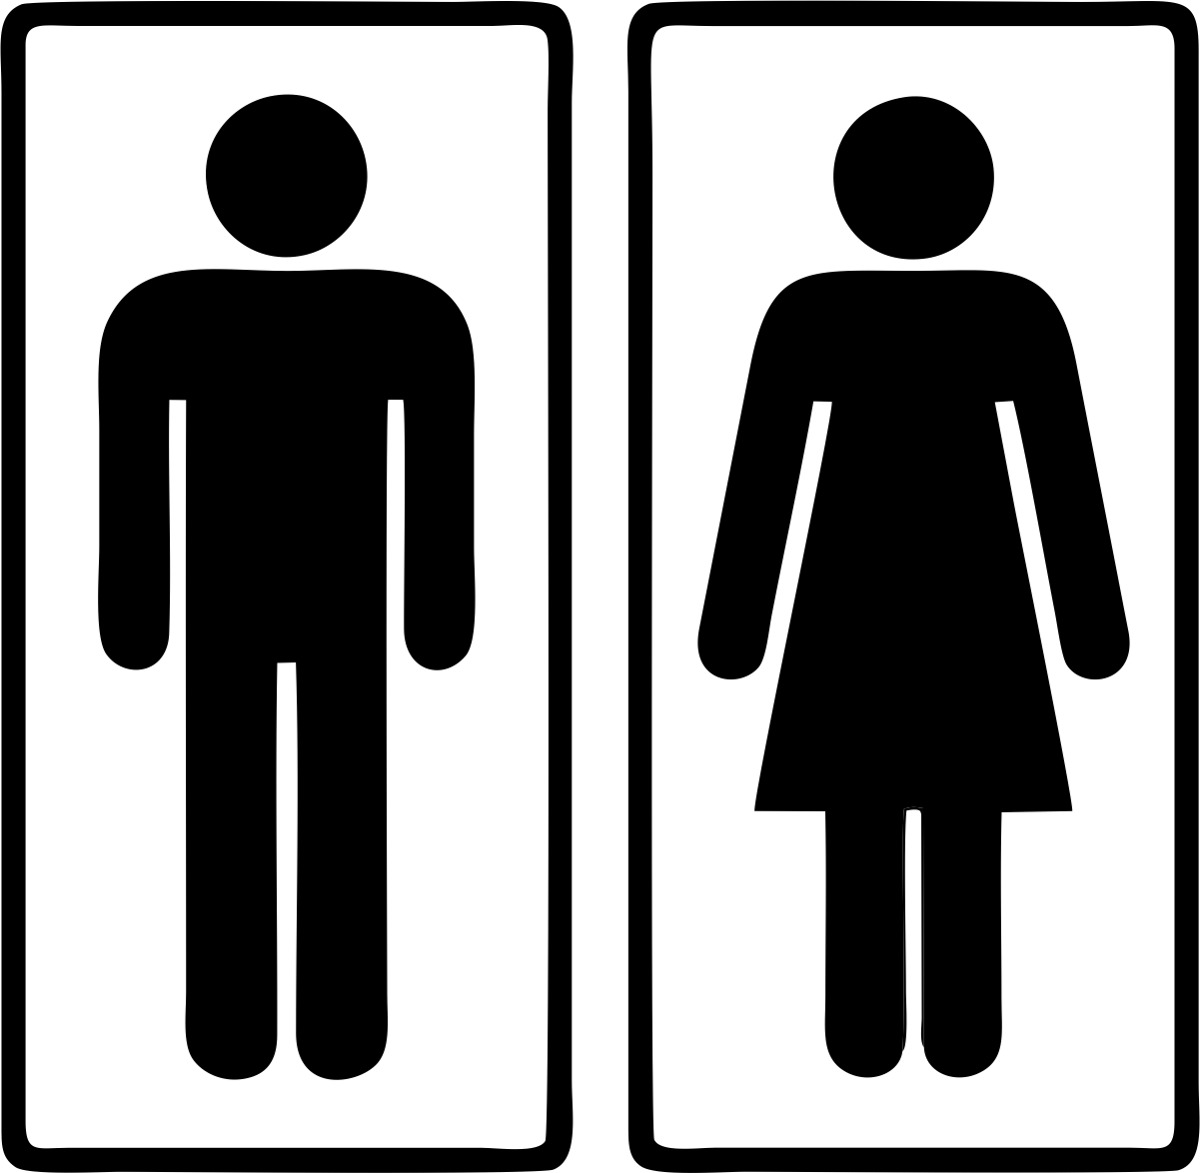 Imagens De Banheiro Para Colorir : Adesivo sinaliza??o banheiro masculino feminino r